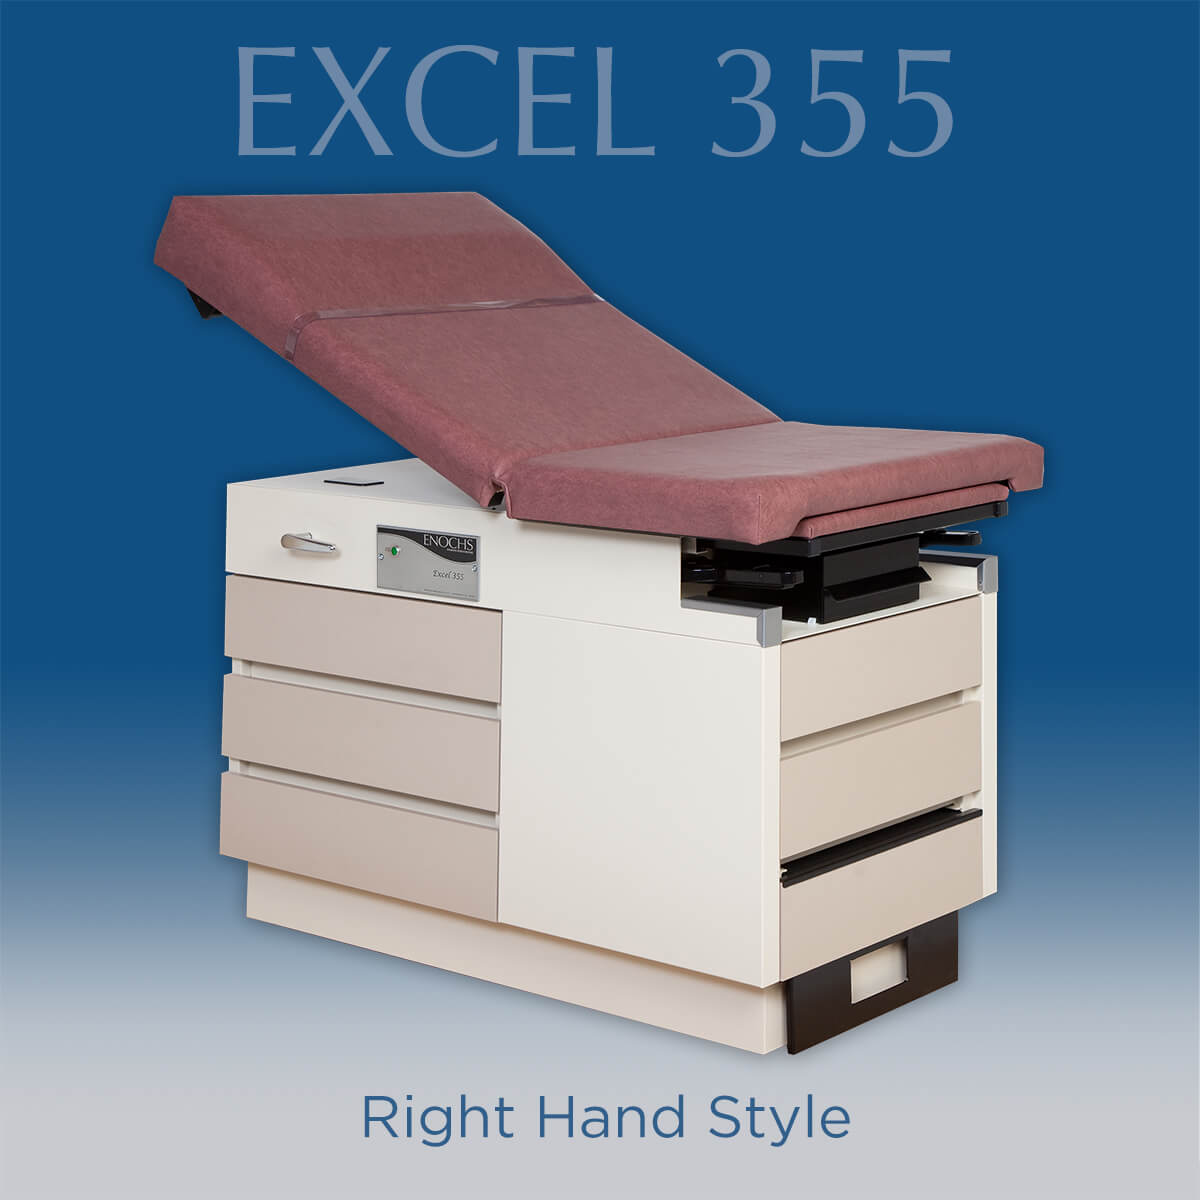 355-RH-Style.jpg